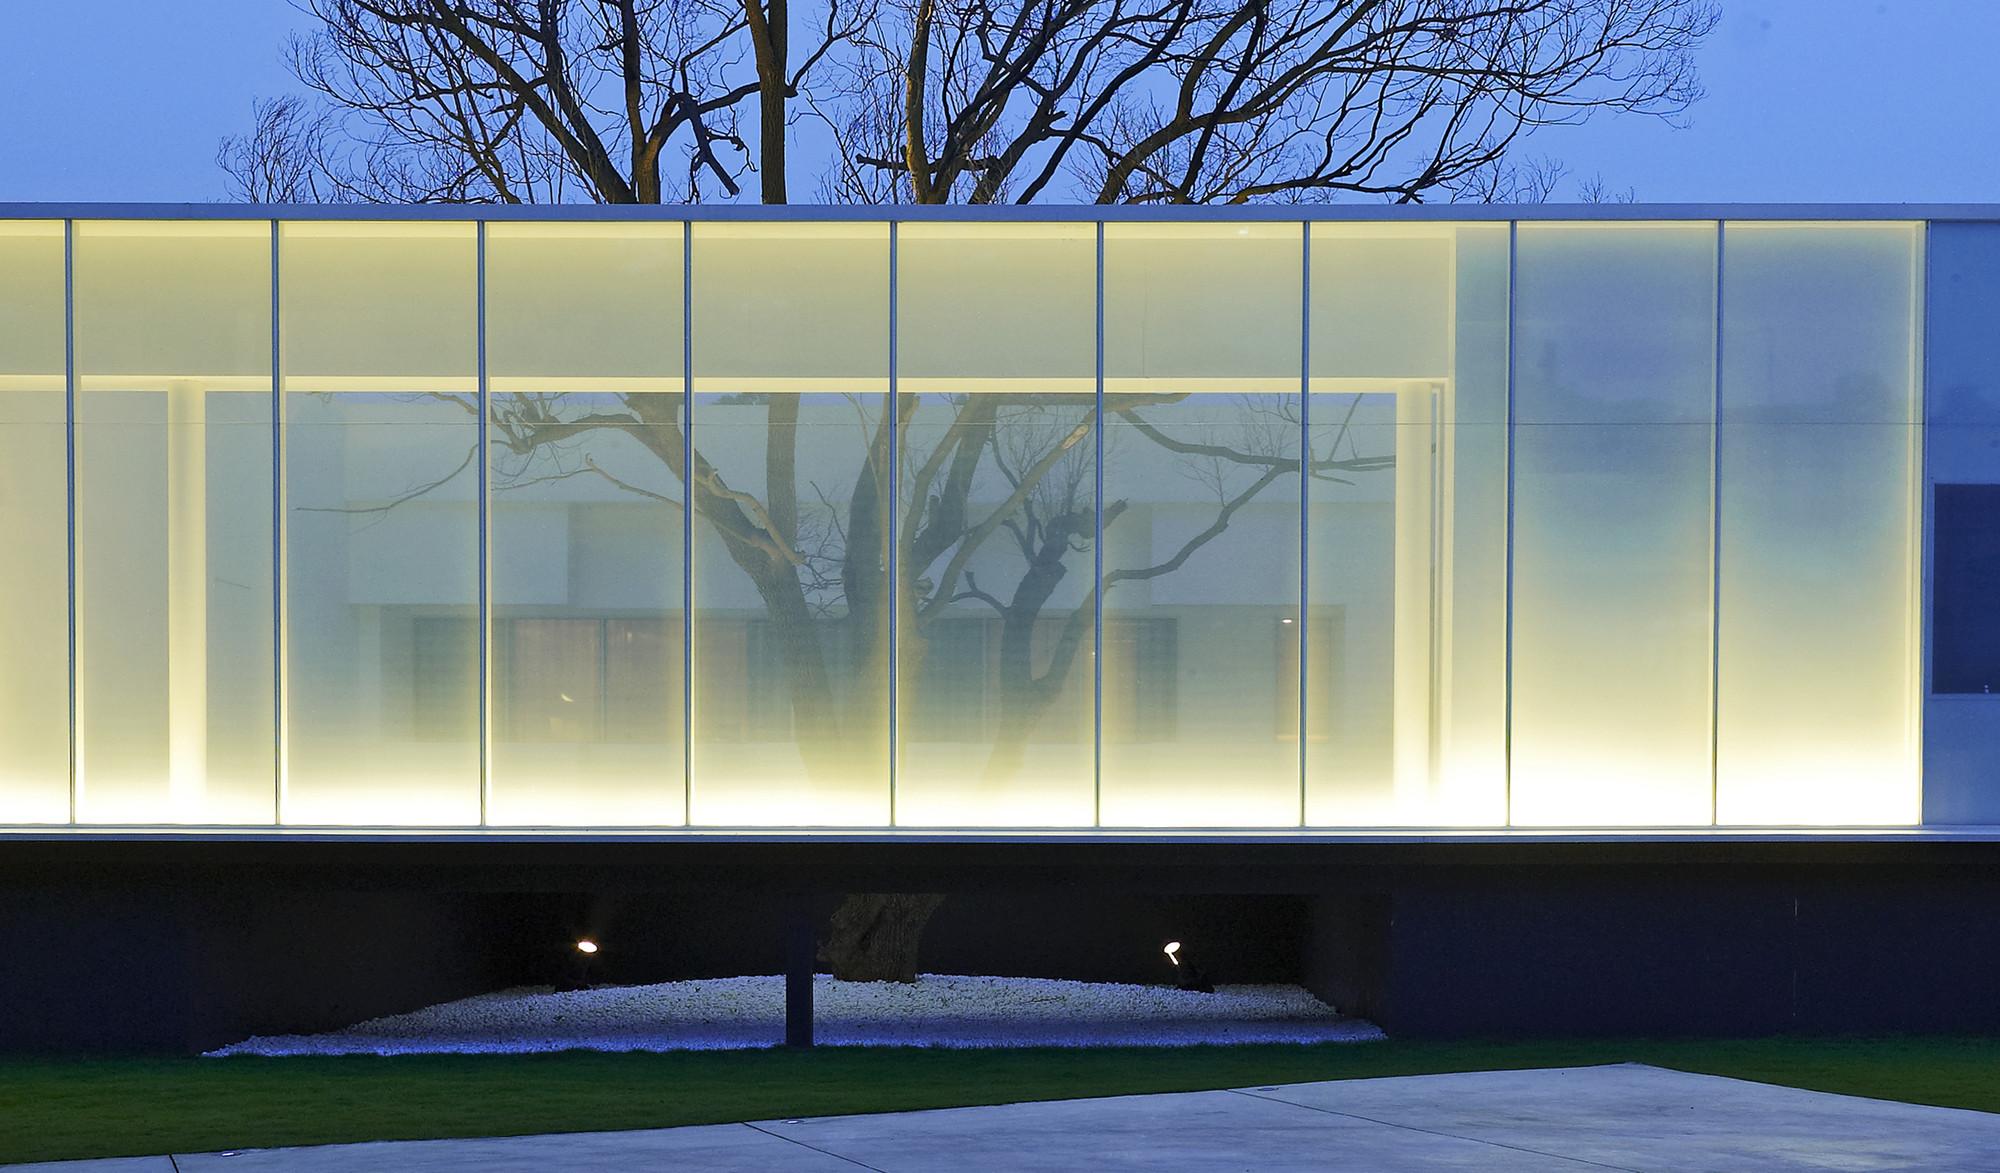 Galeria de lightbox hsuyuan kuo architect associates 5 for Architect associates